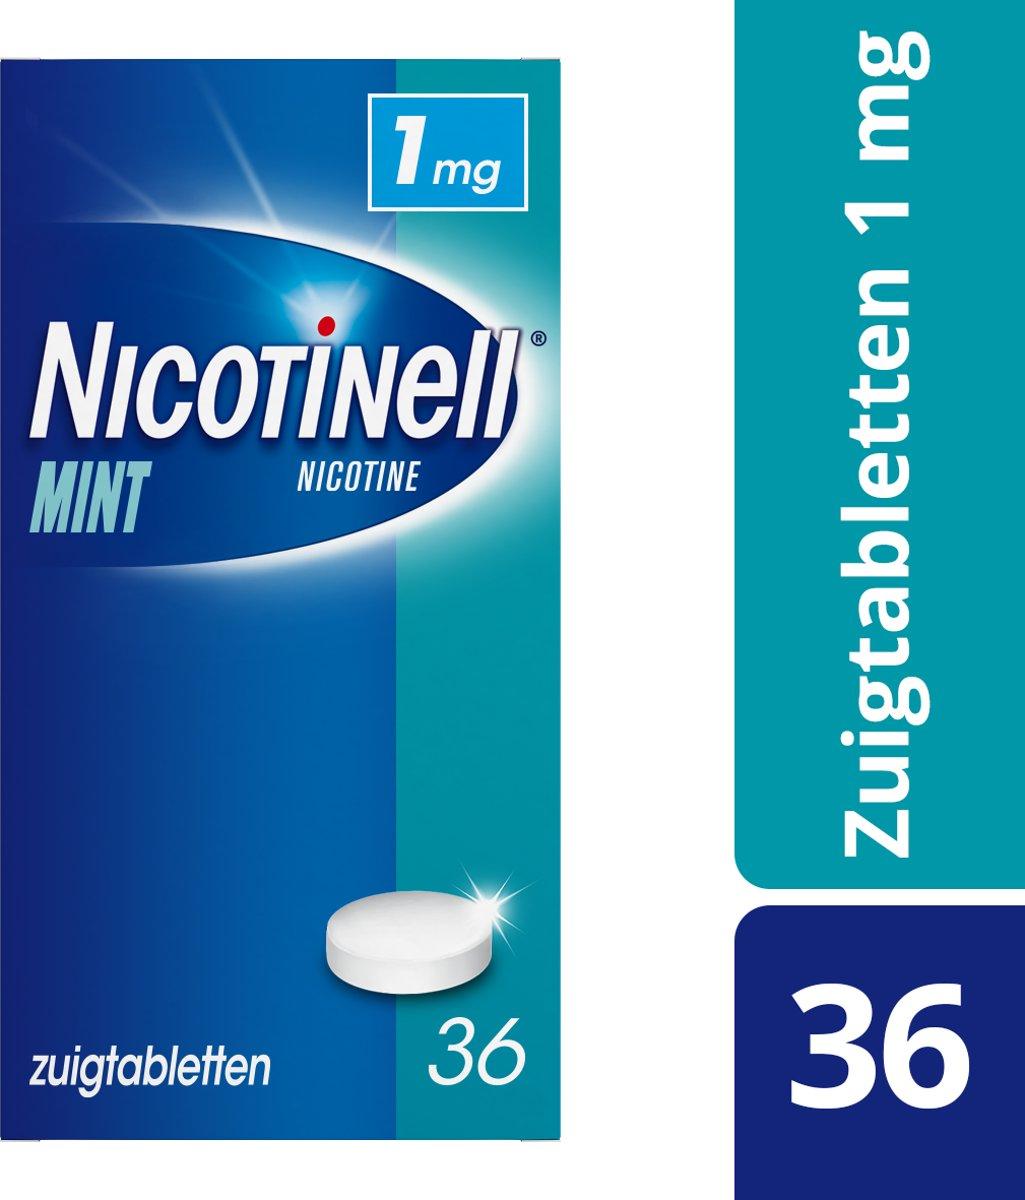 Nicotinell Mint 1 mg zuigtablet - 36 stuks - Antirookbehandeling